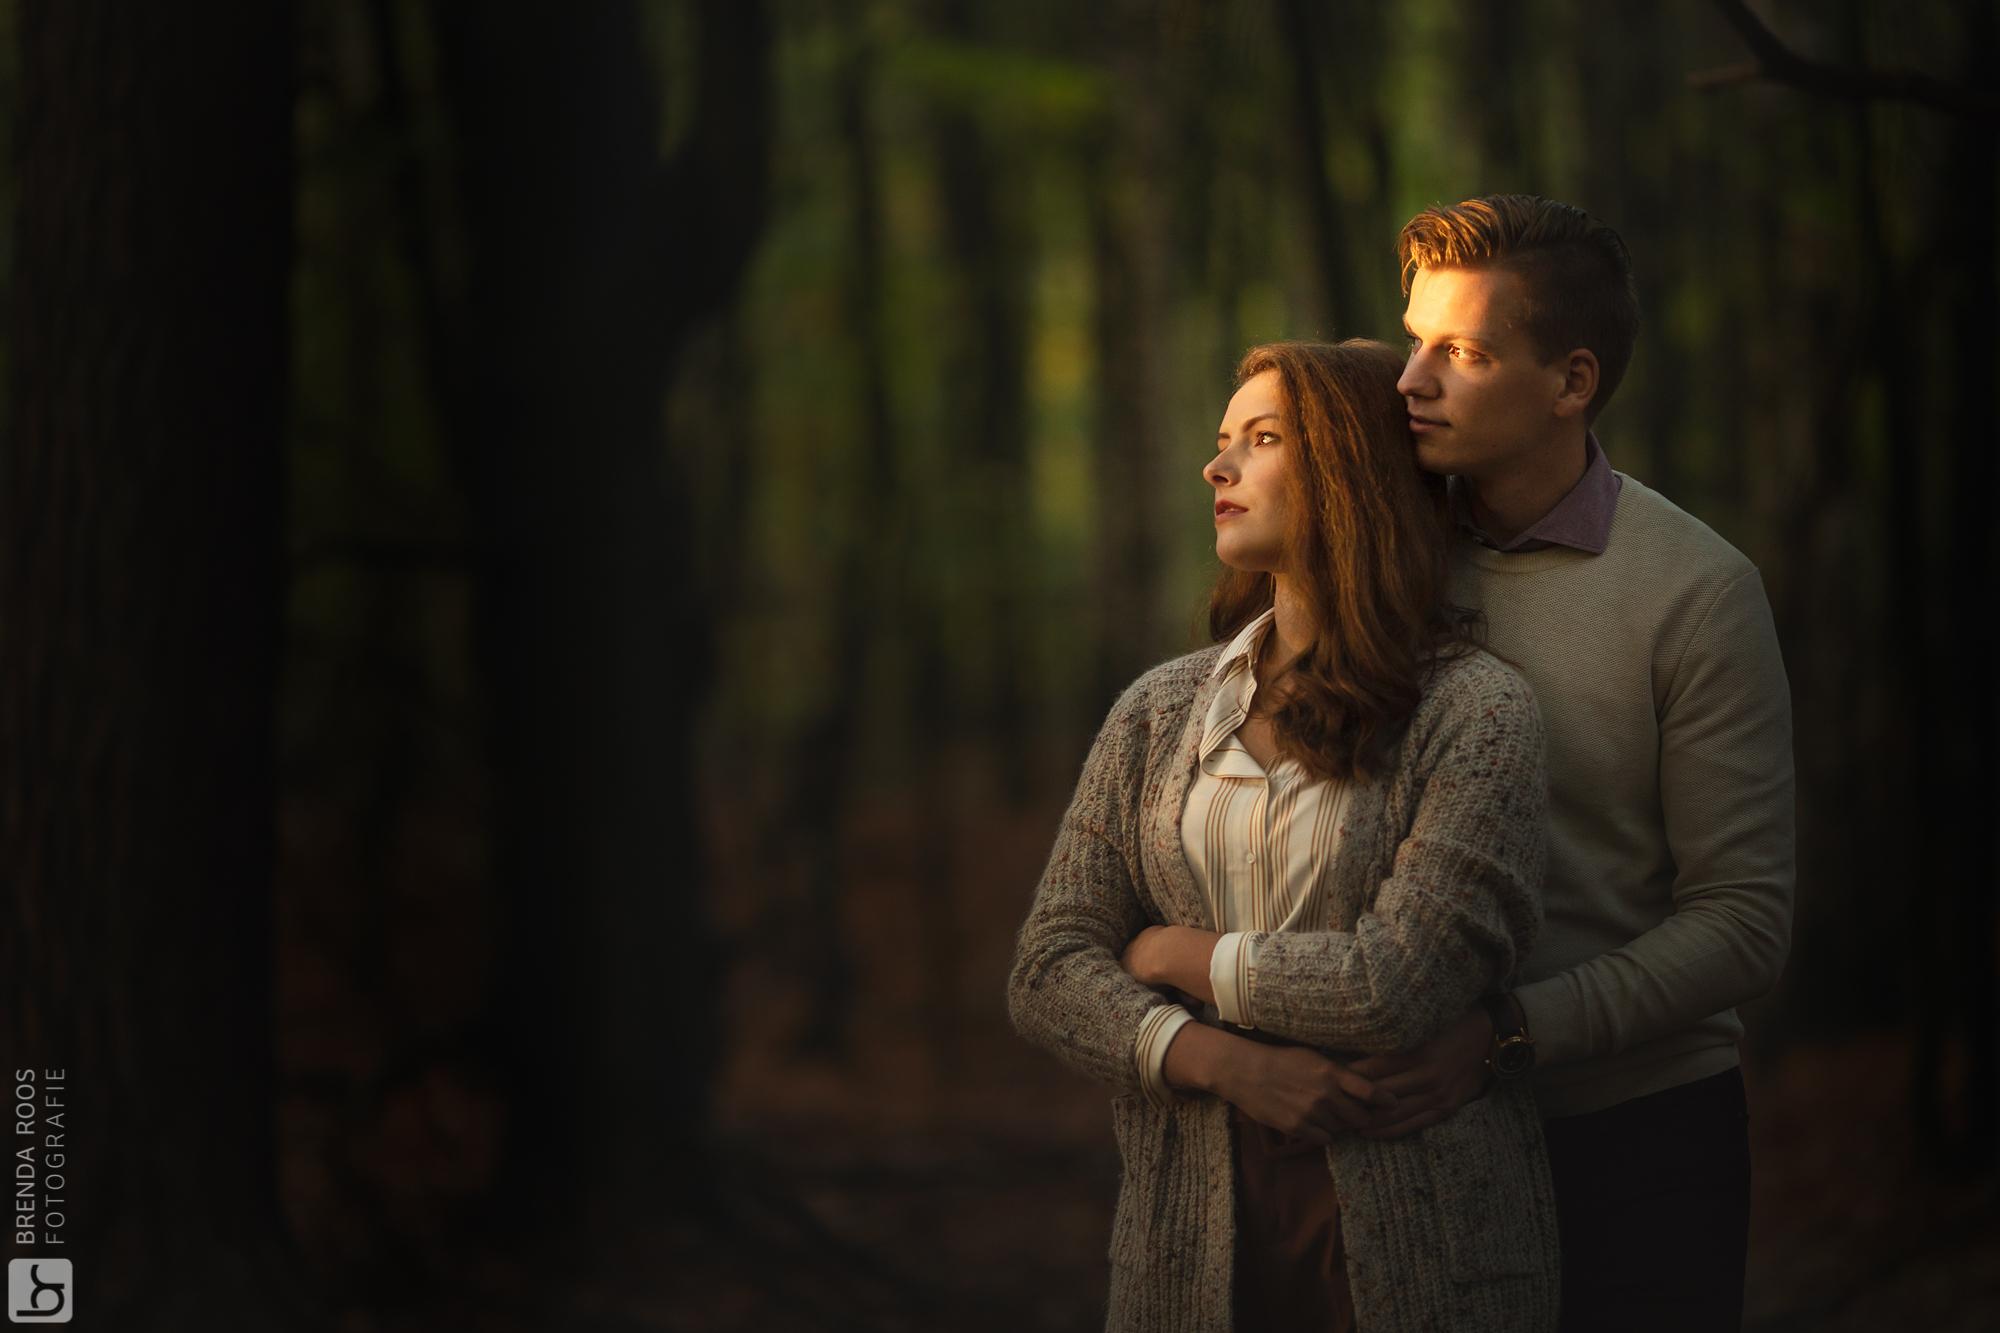 Familie fotograaf loveshoot ermelo veluwe leuvenumse bos